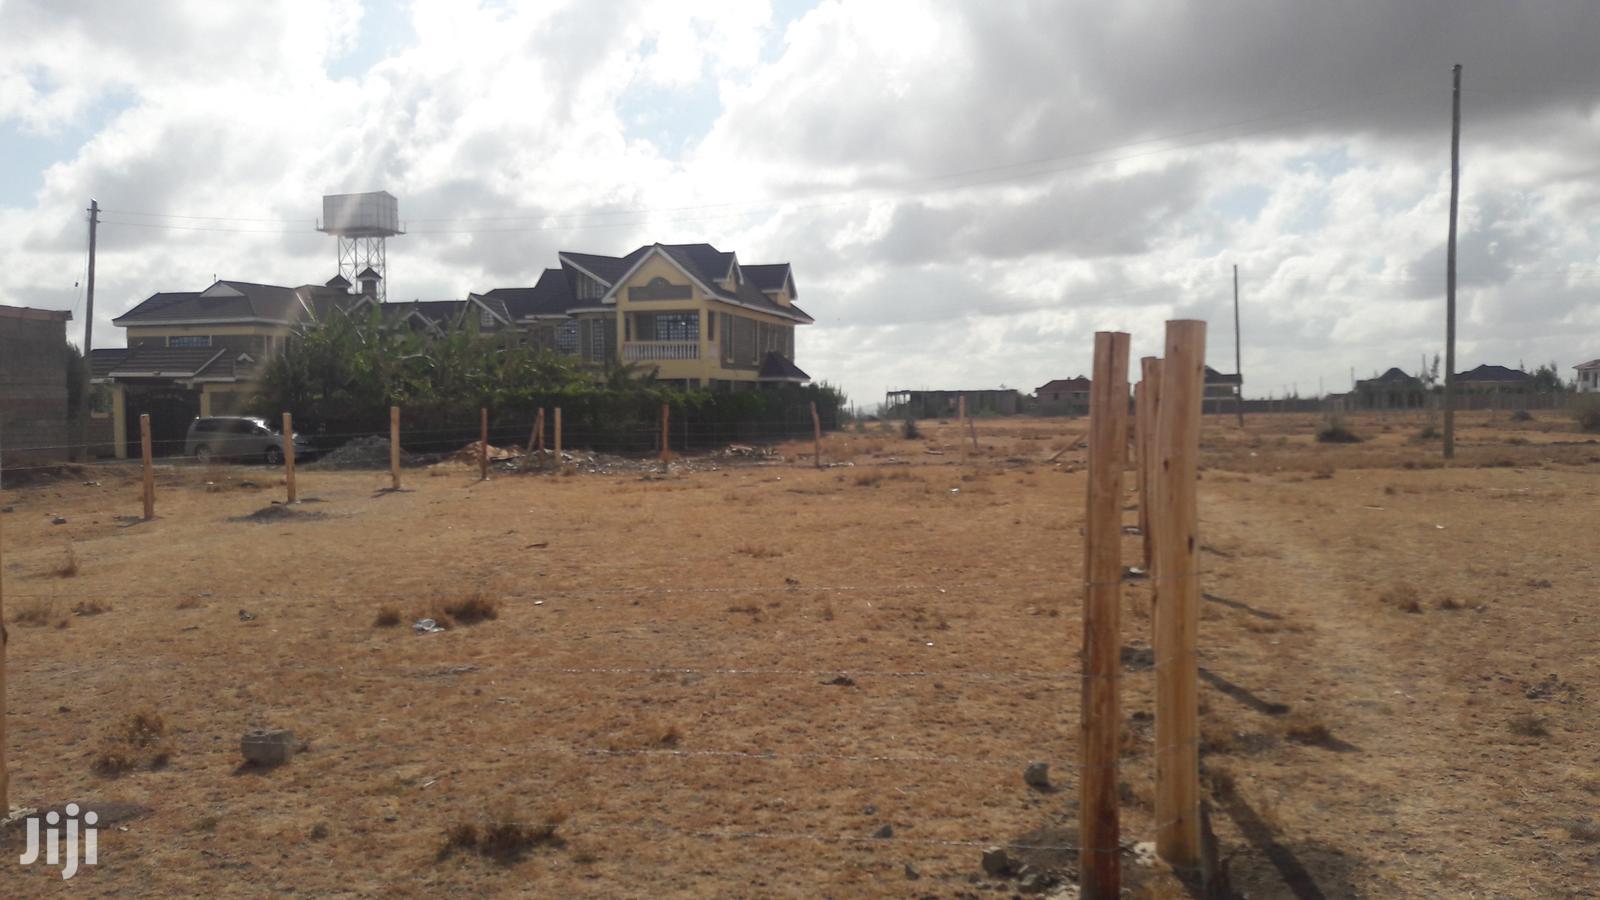 1/4 Acre Plot - Police Sacco Gardens (Phase II) Kitengela